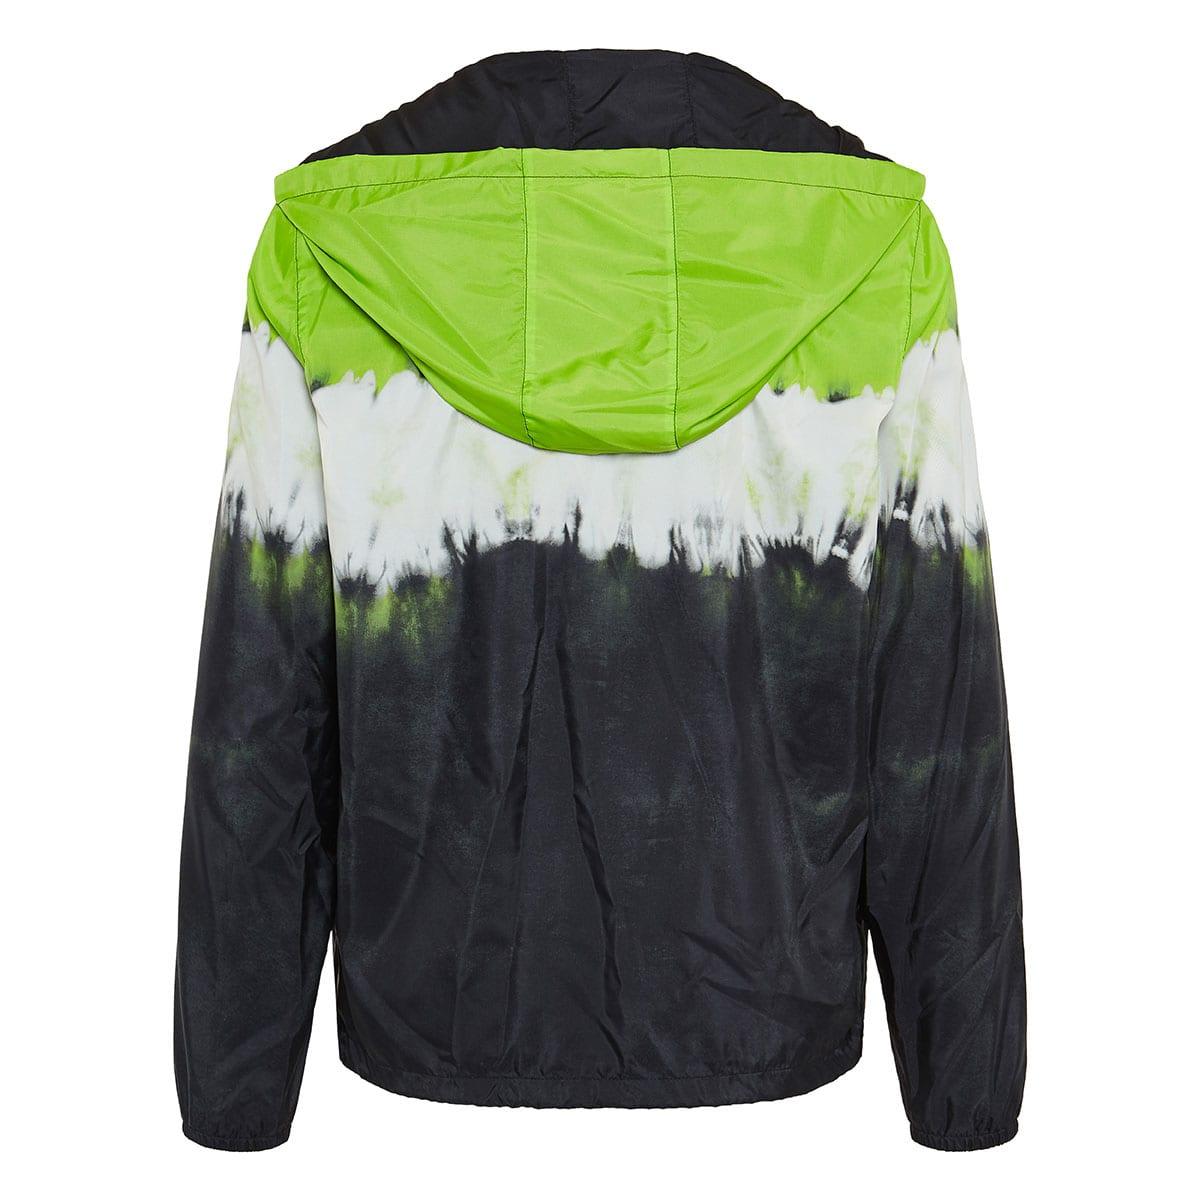 Tie-dye nylon jacket